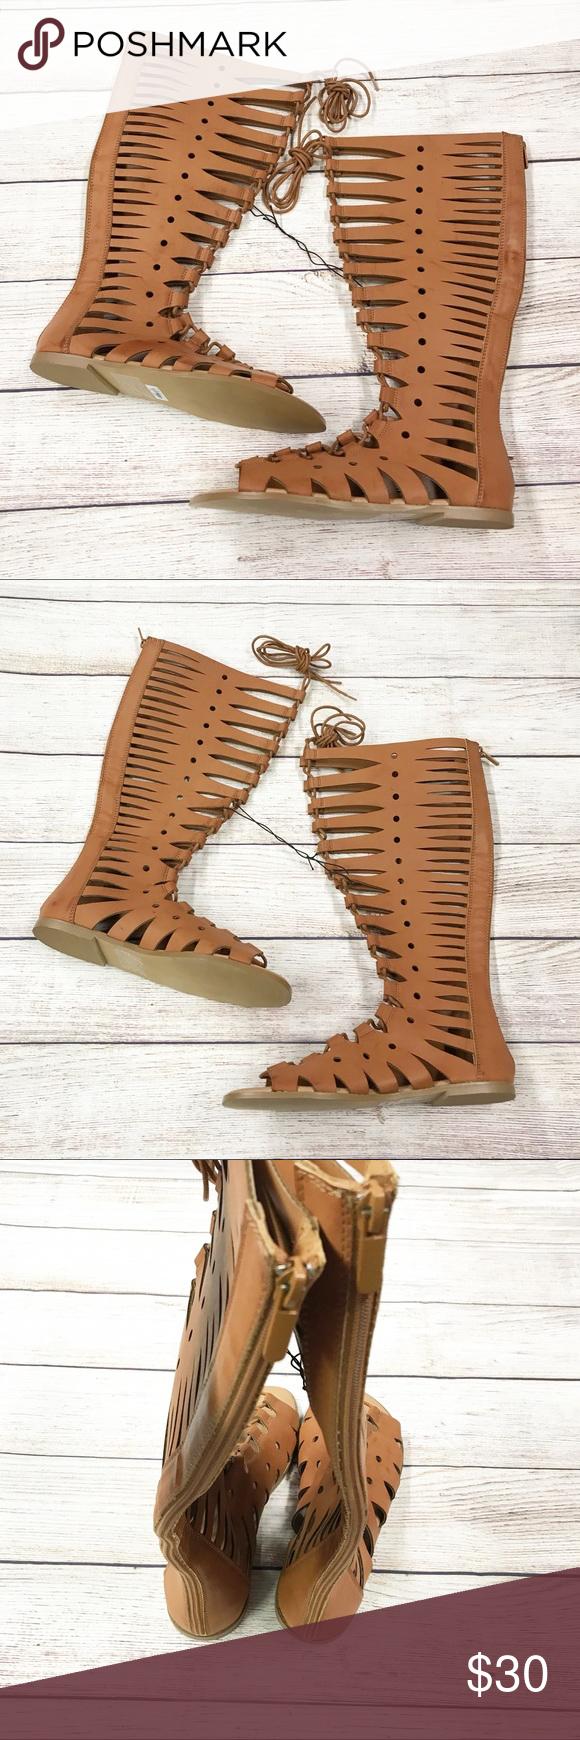 47d6c7530c43 NEW Torrid Wide Calf Knee High Gladiator Sandals Fierce knee high gladiator  sandals from Torrid!